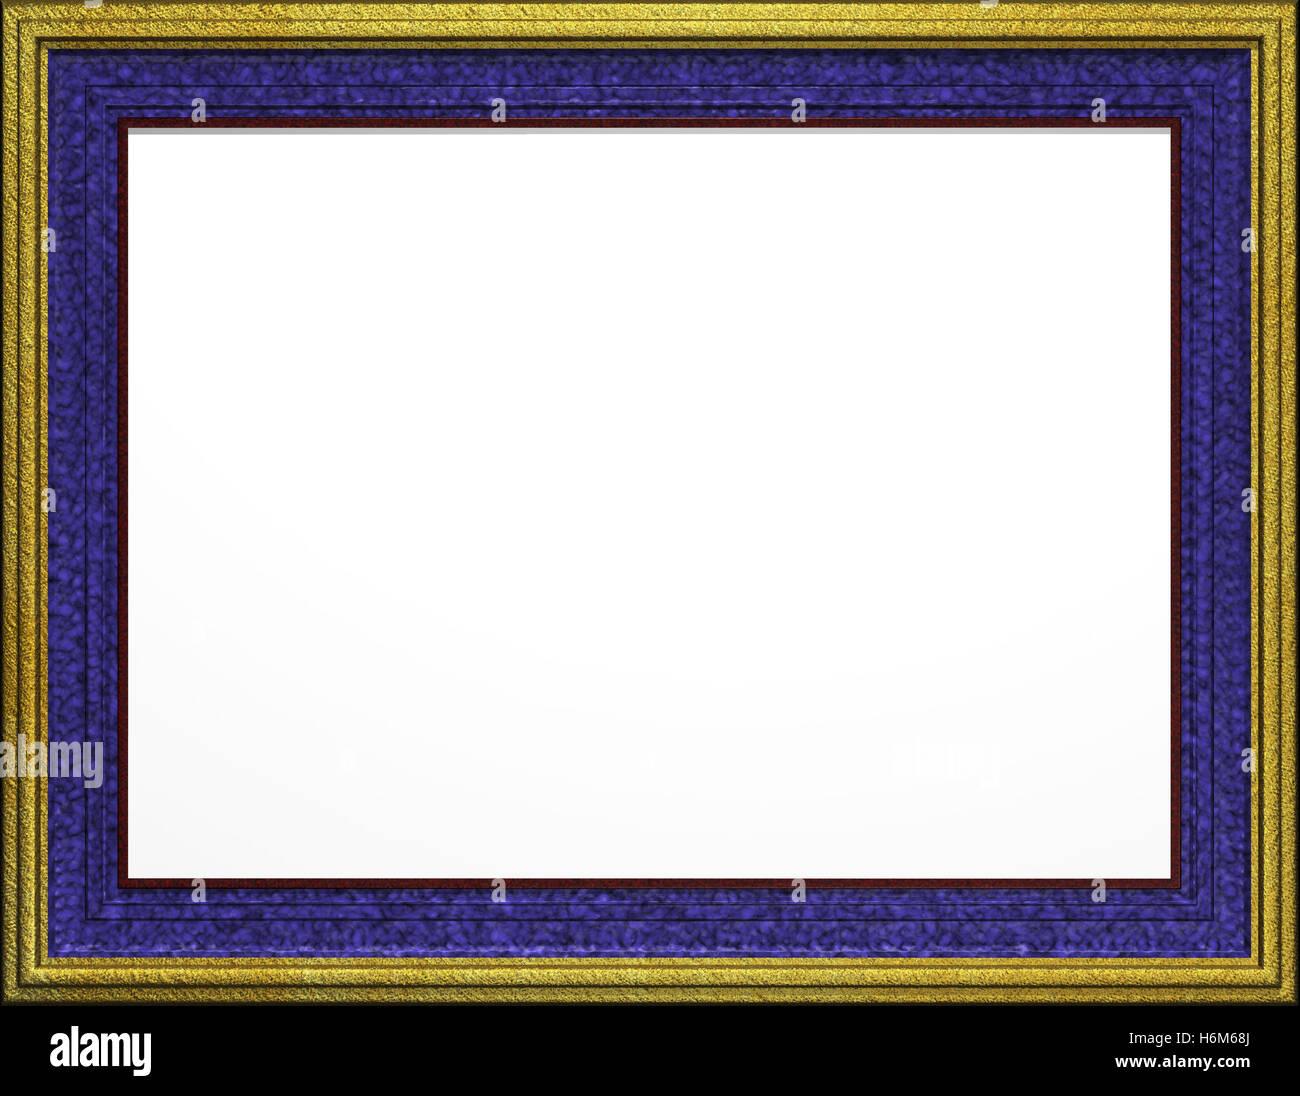 Berühmt Gemälderahmen Fotos - Rahmen Ideen - markjohnsonshow.info